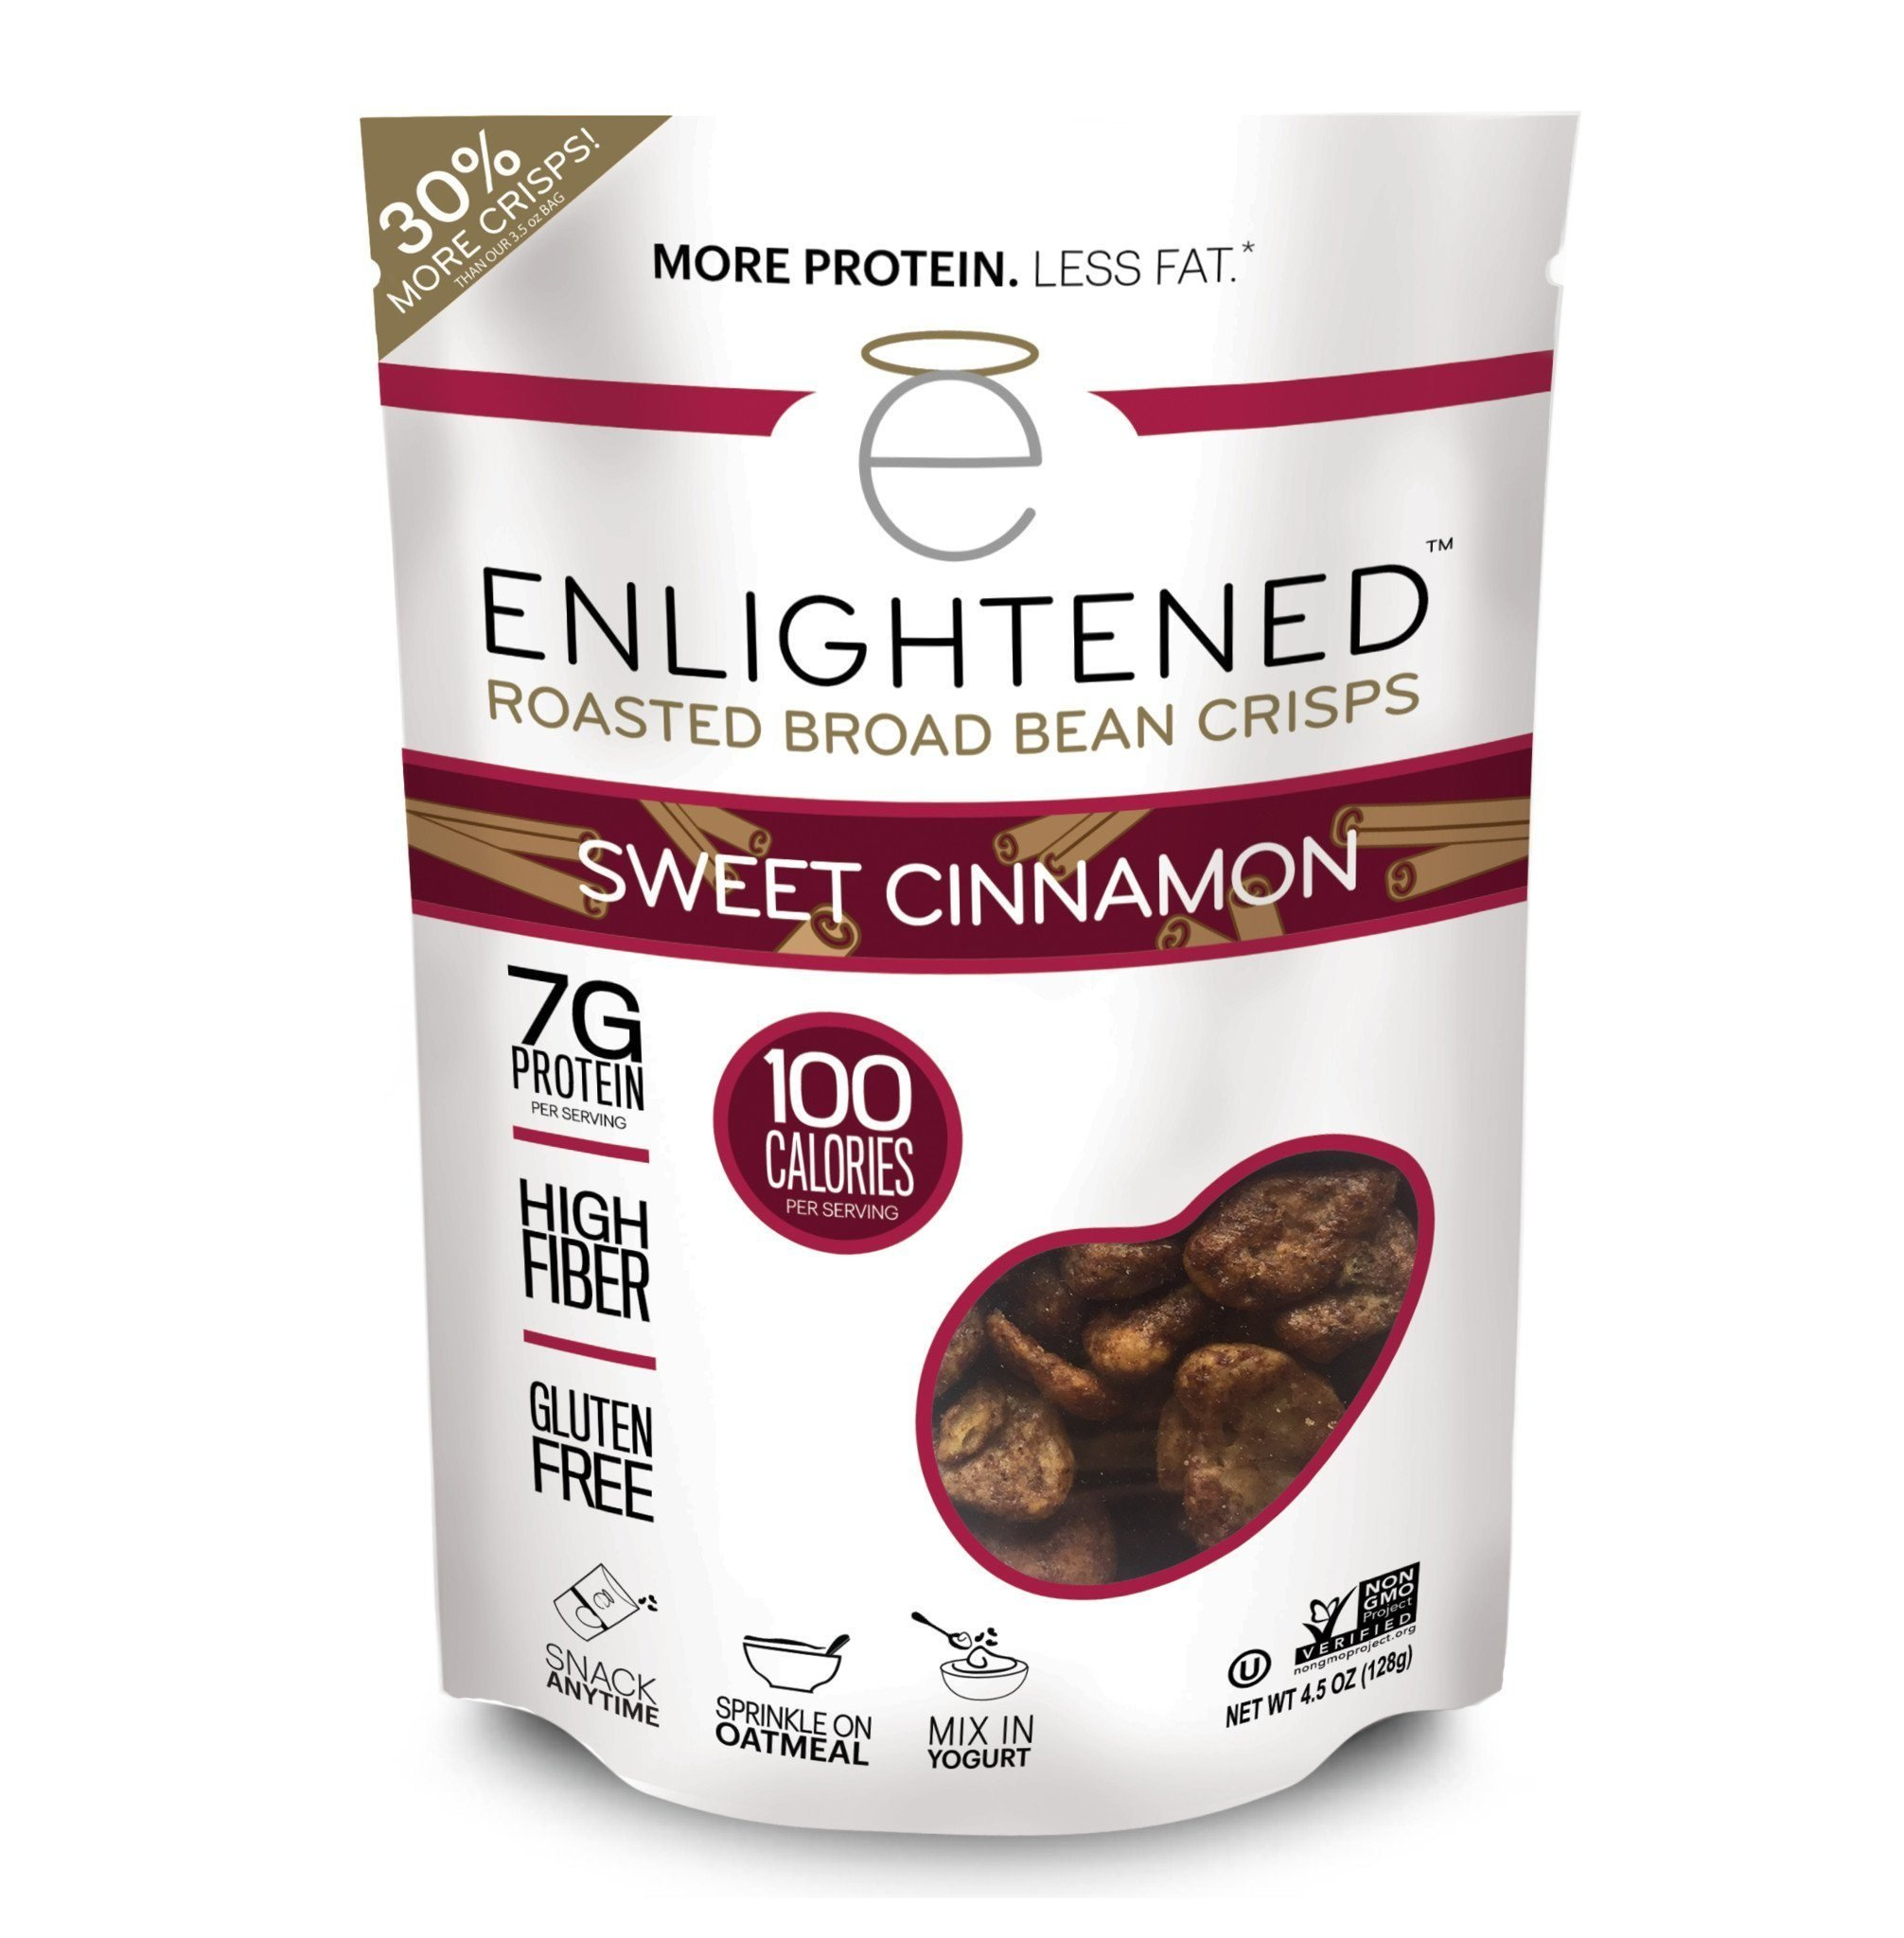 Enlightened Roasted Broad Bean Crisps - Sweet Cinnamon 4.5 OZ / Singles